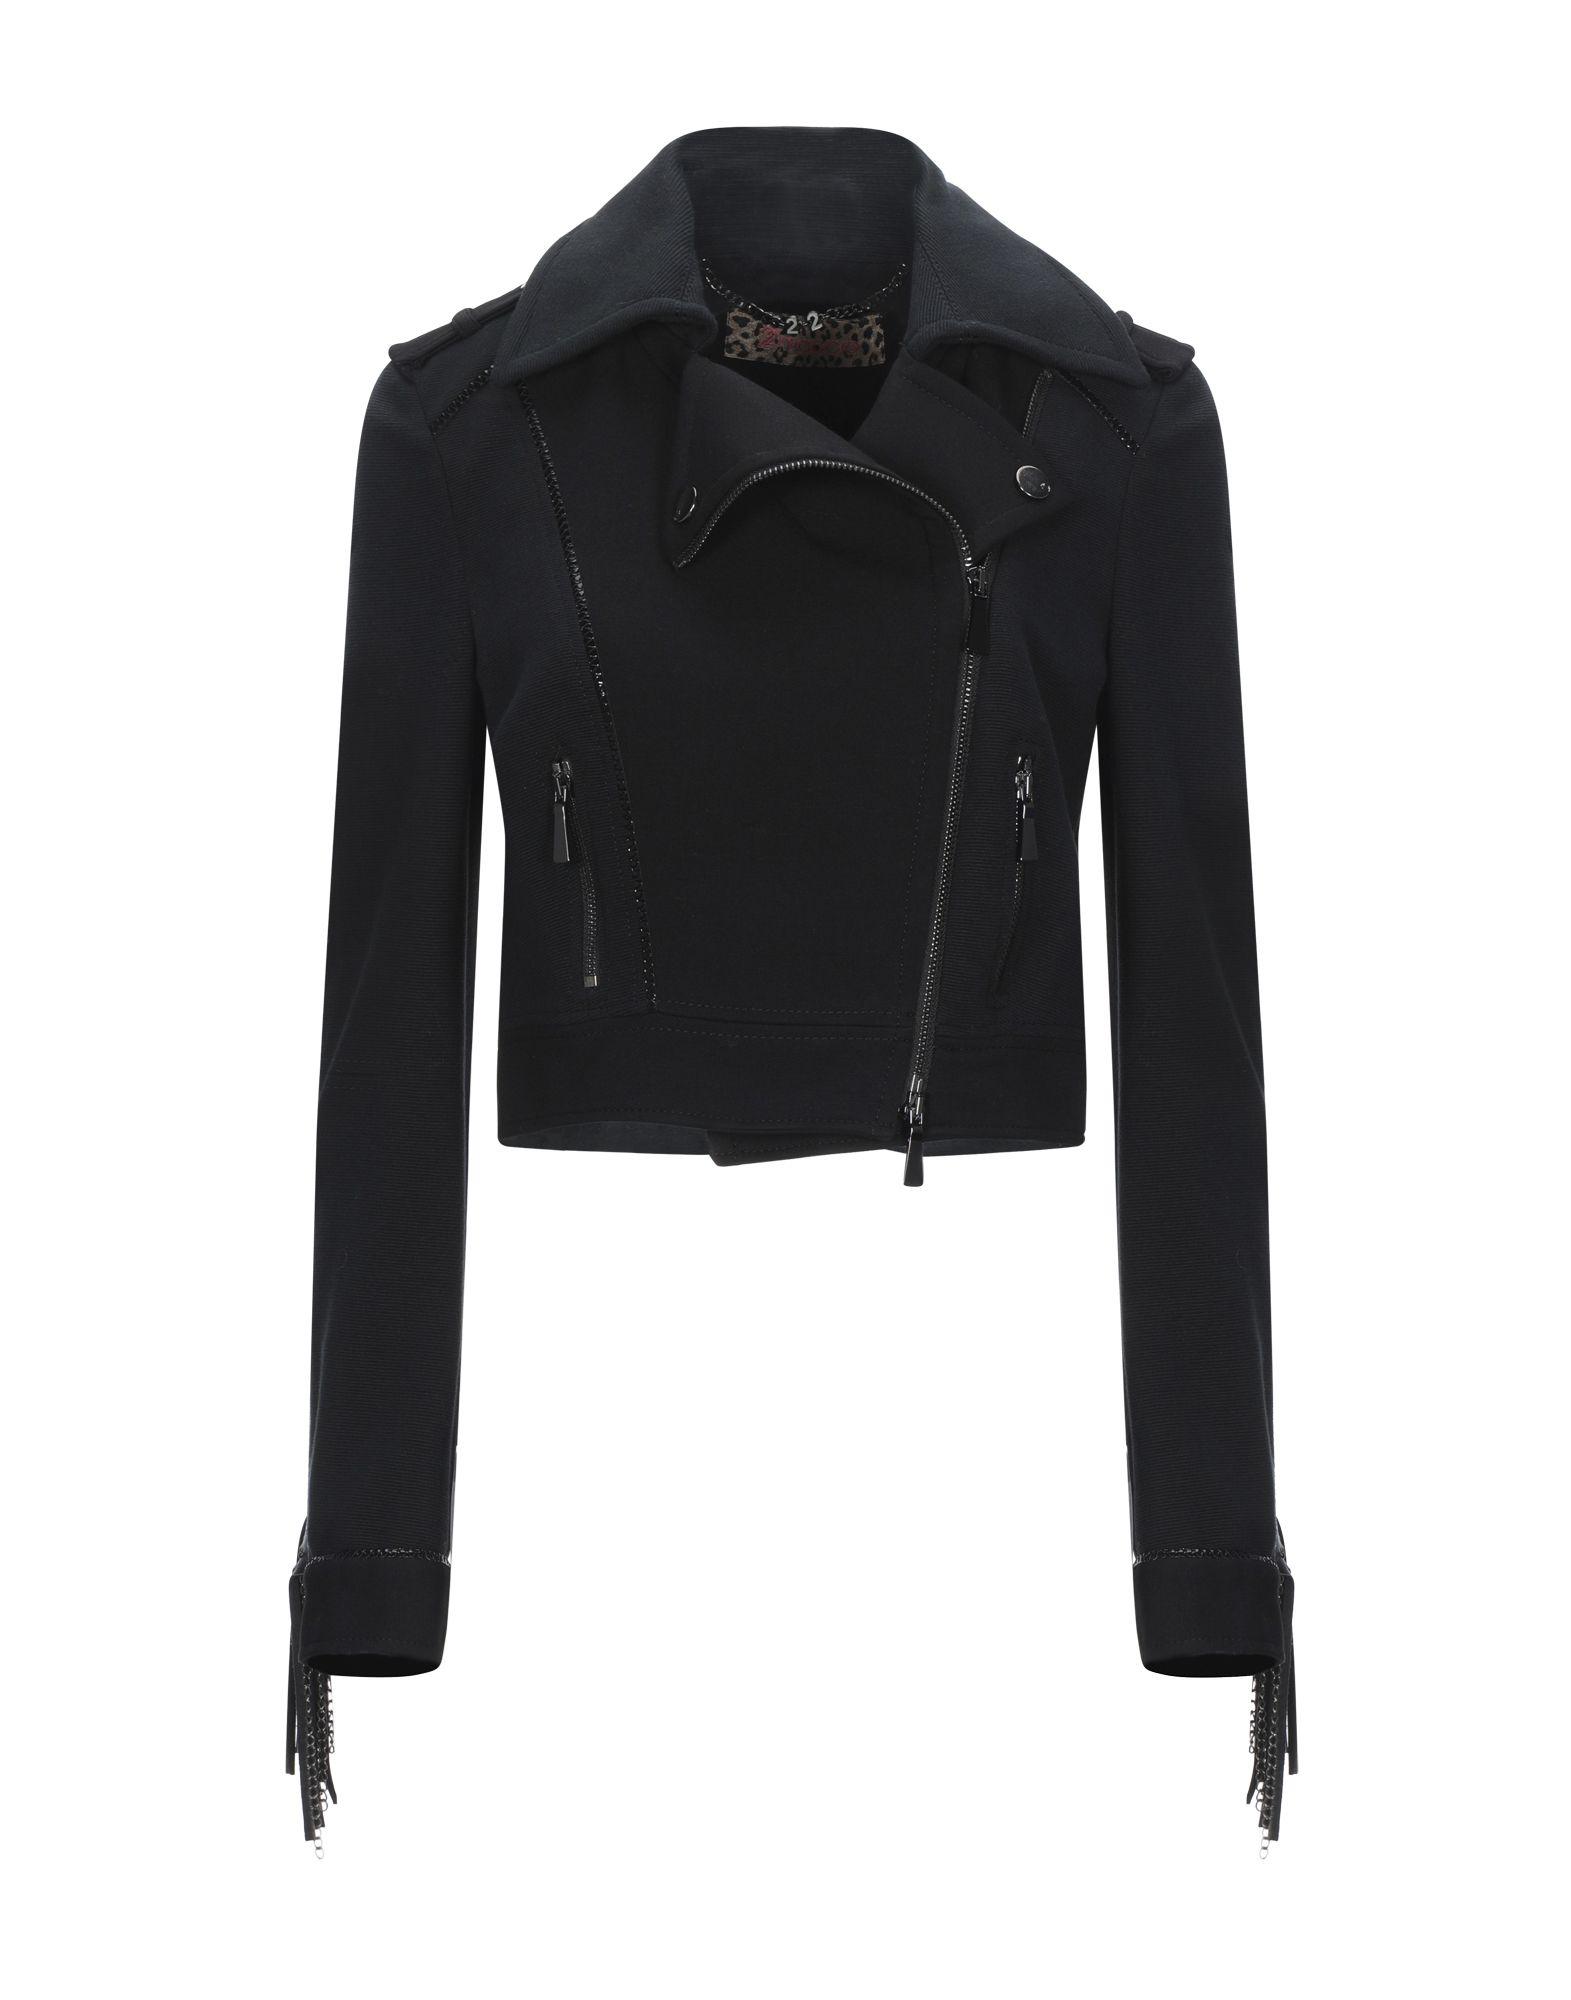 22 MAGGIO by MARIA GRAZIA SEVERI Куртка куртка с запахом maria intscher